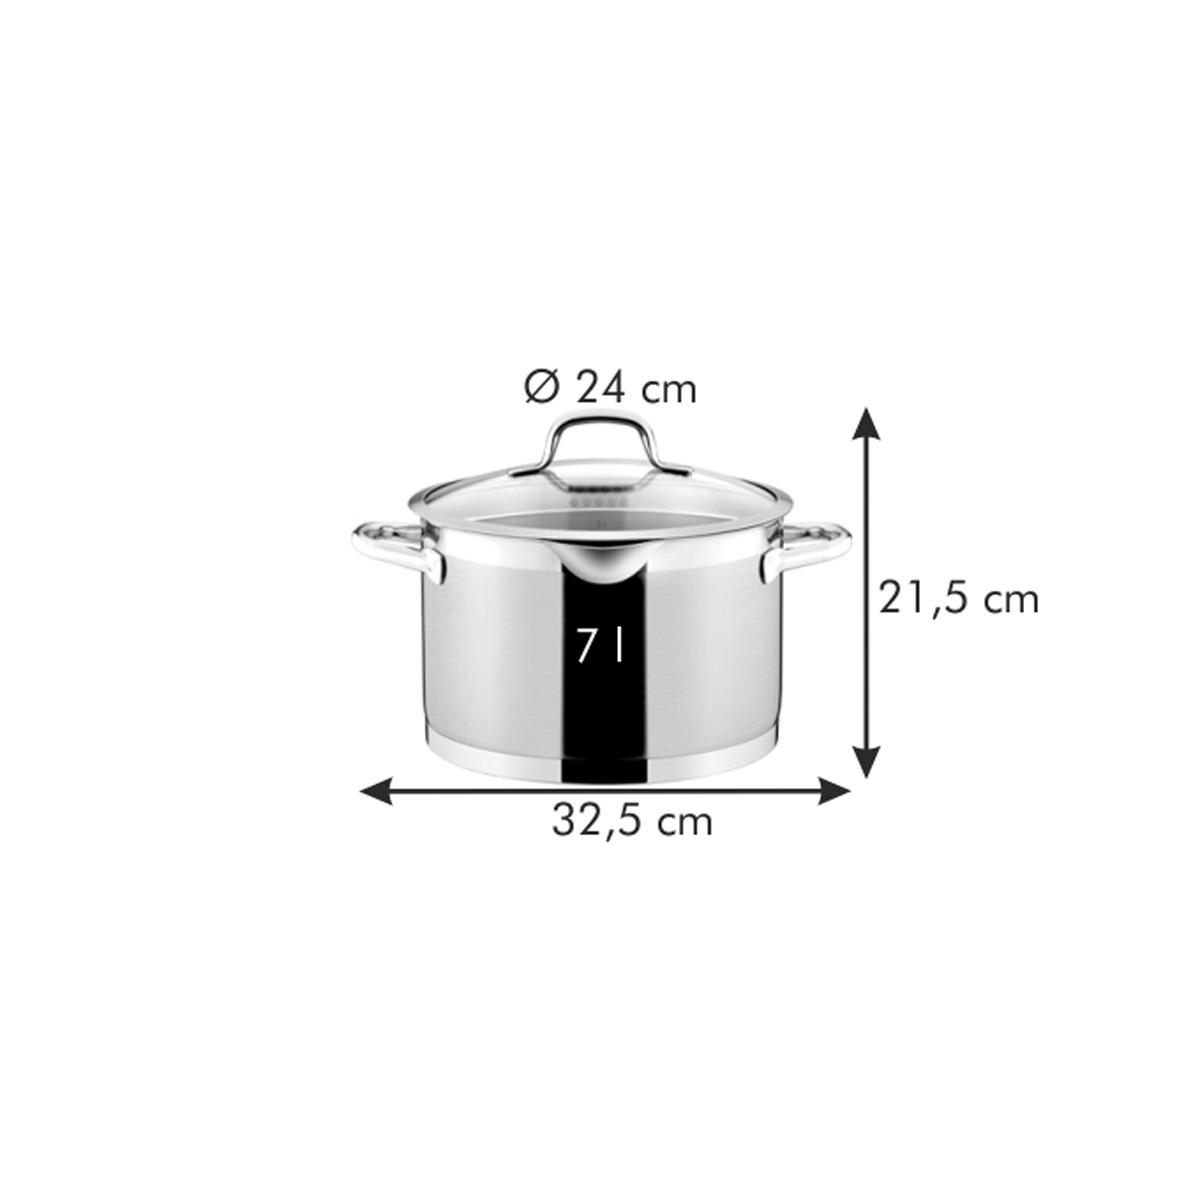 Hrnec PRESIDENT s cedicí poklicí ø 24 cm, 7.0 l